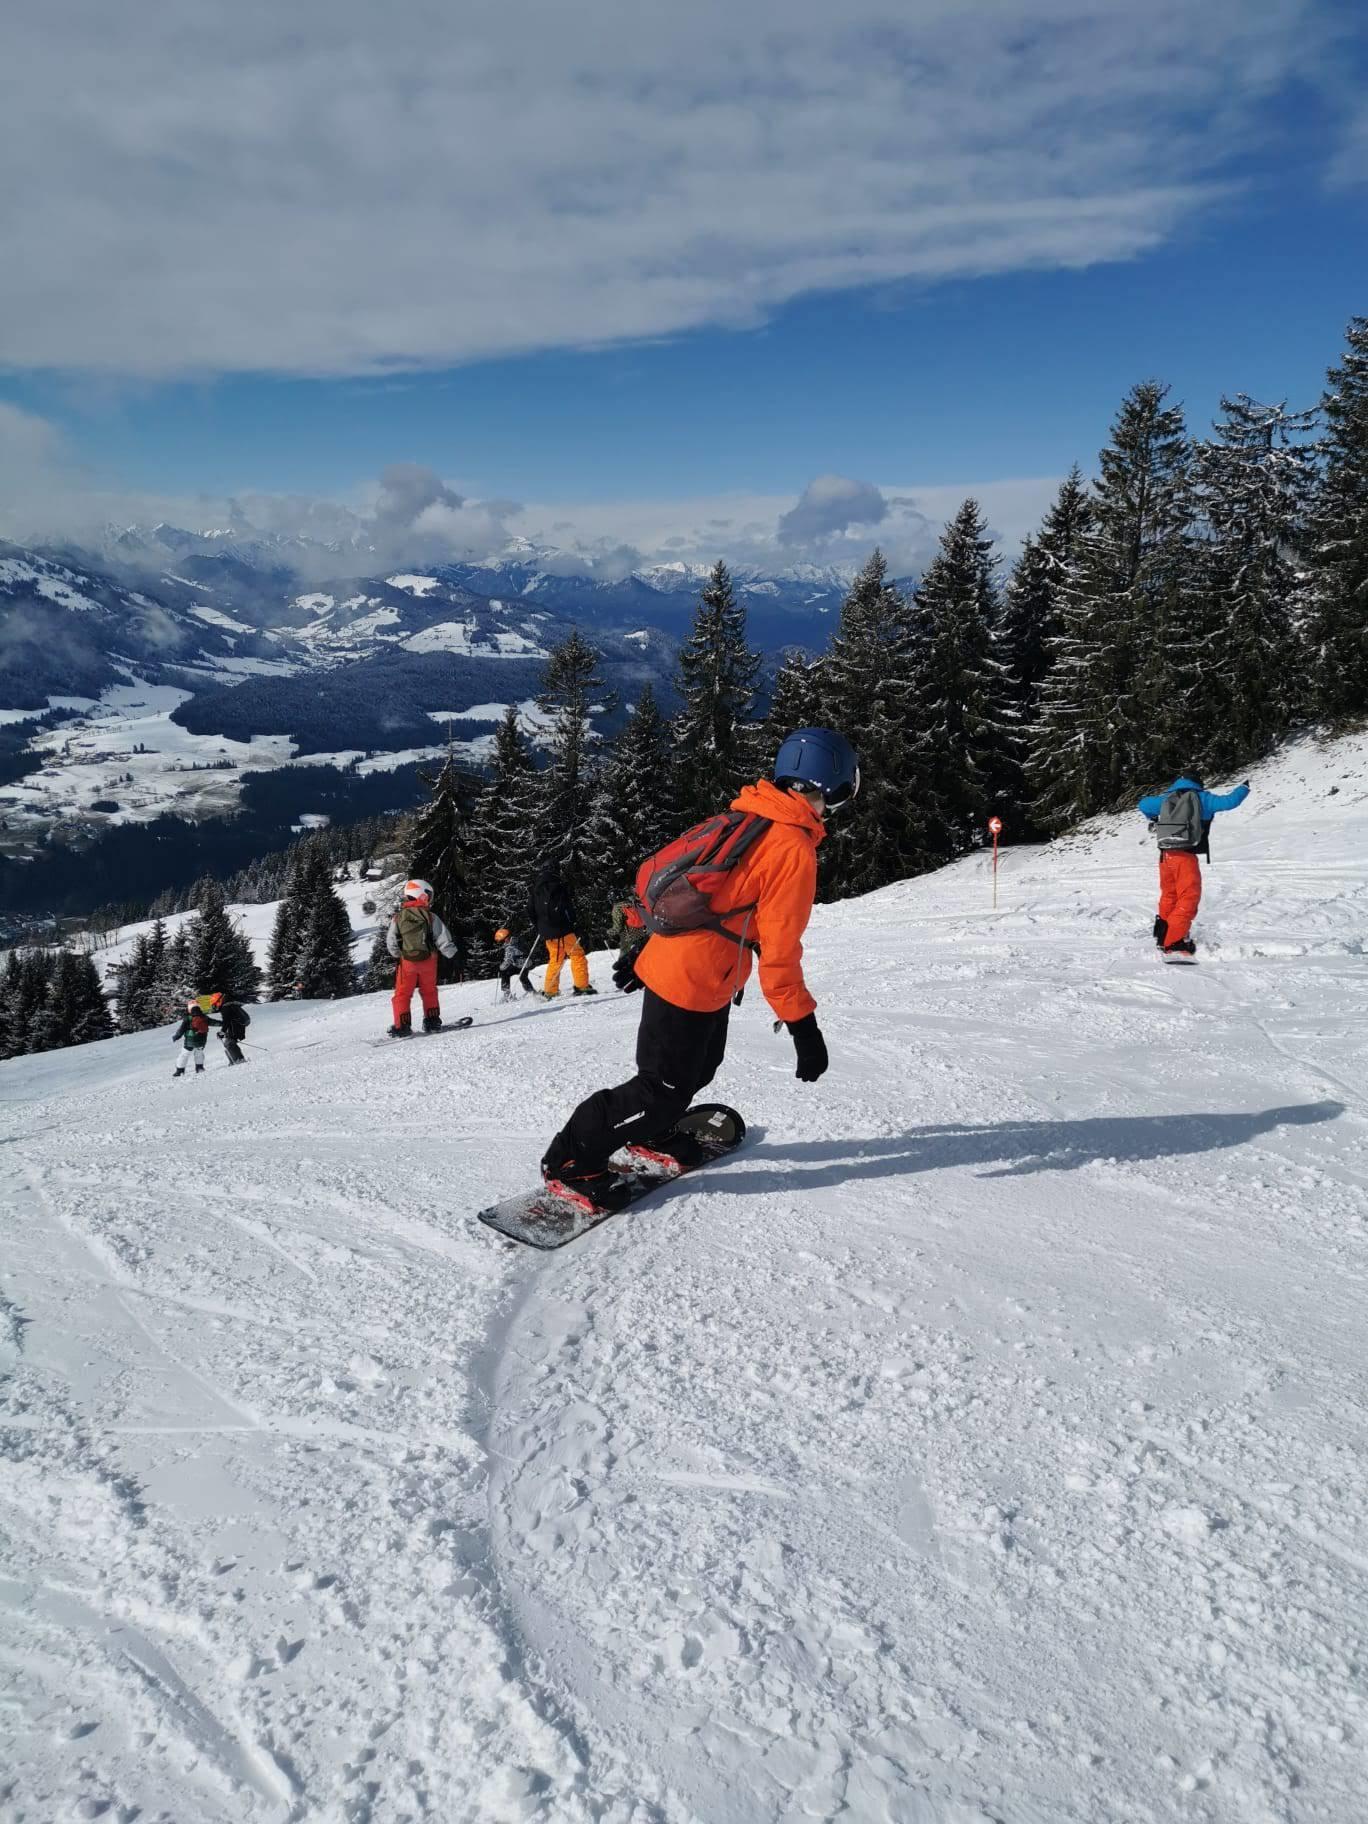 [2022] Vier skigebieden in één skipas! (snowboarden) - Krokus - Mariapfarr